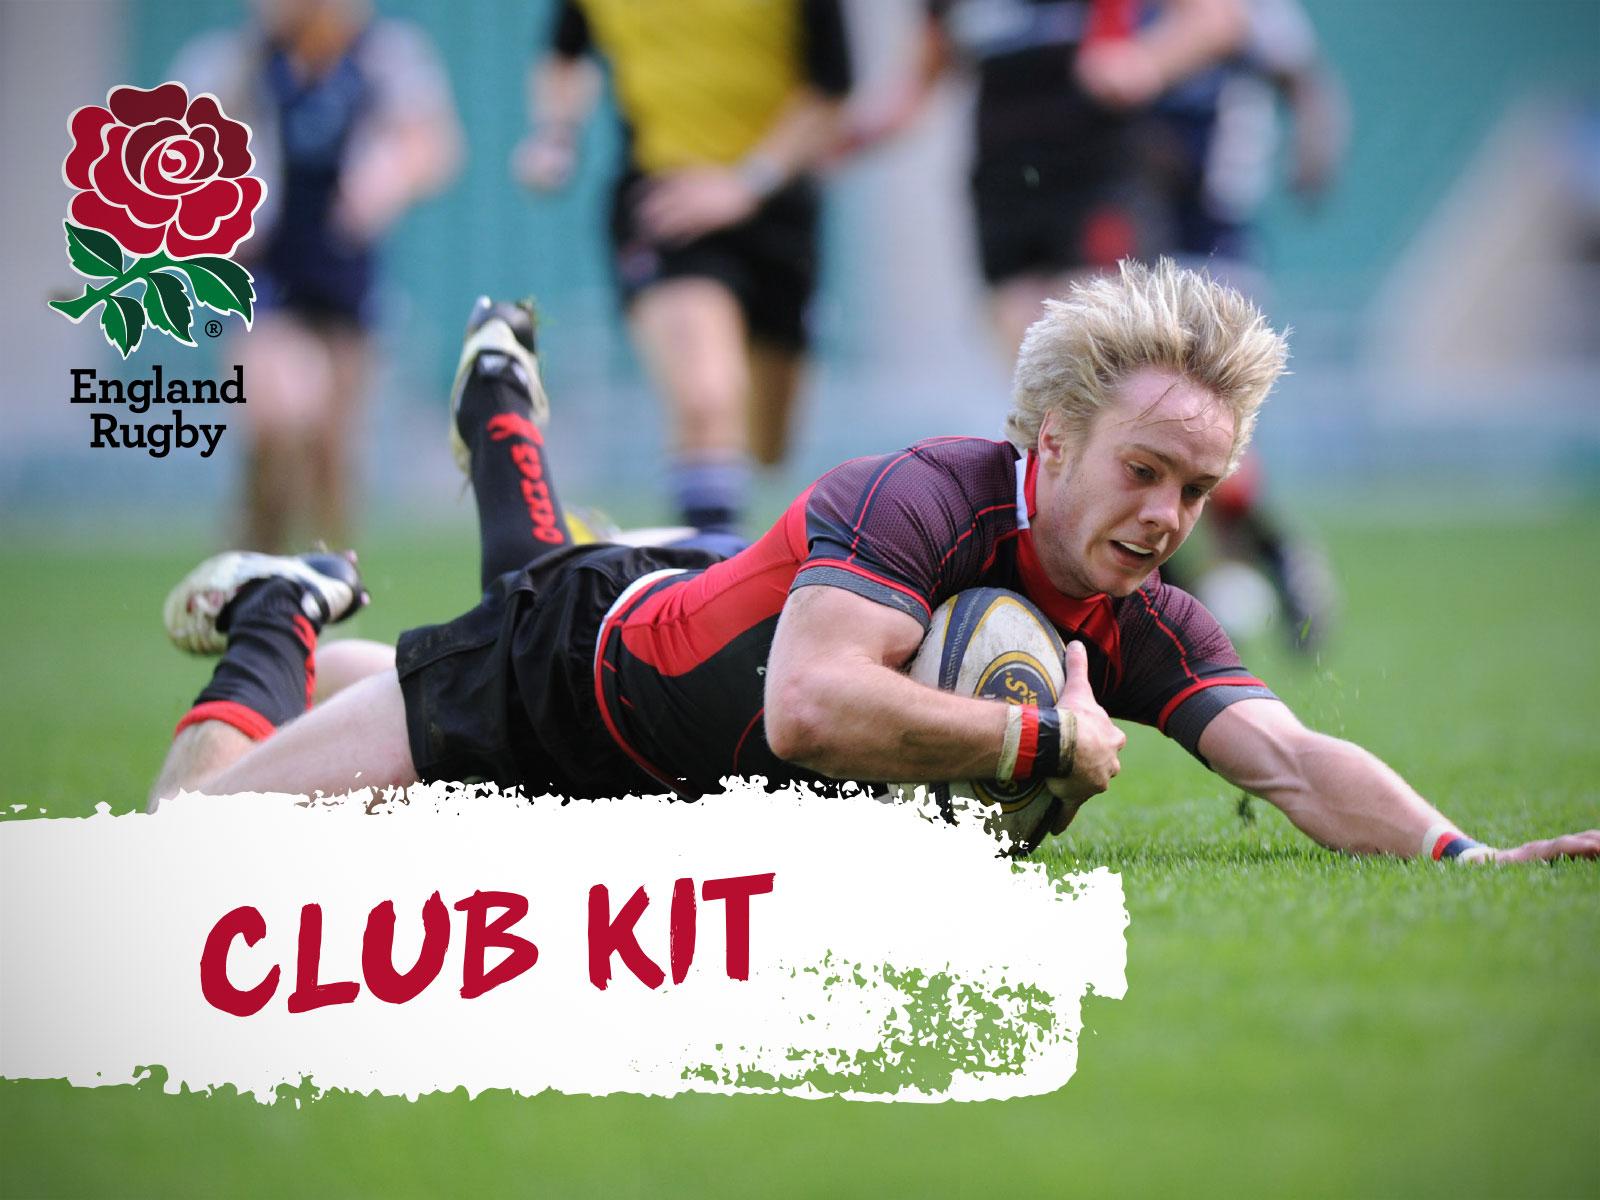 England Rugby brochure design